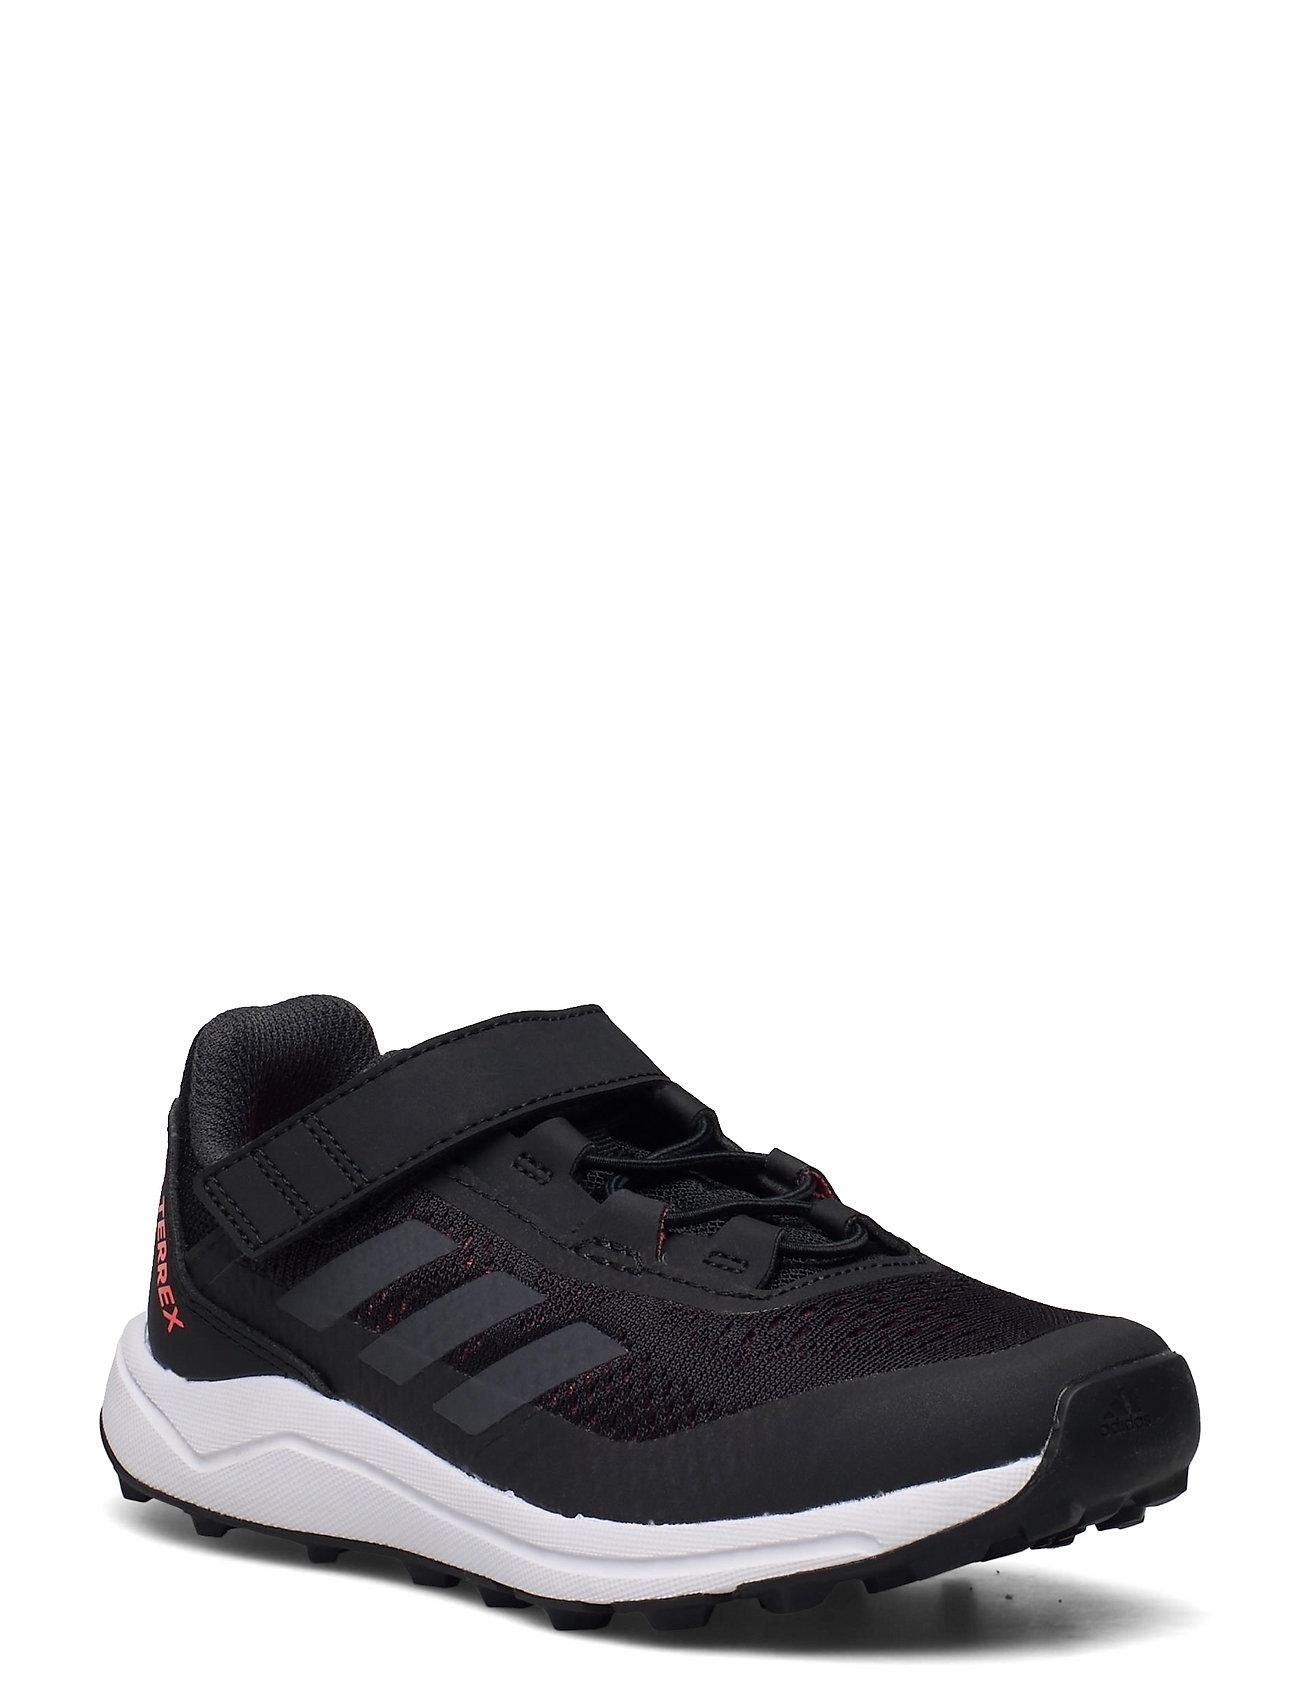 Terrex Agravic Flow Primegreen Trail-Running Shoes Sports Shoes Running/training Shoes Sort Adidas Performance